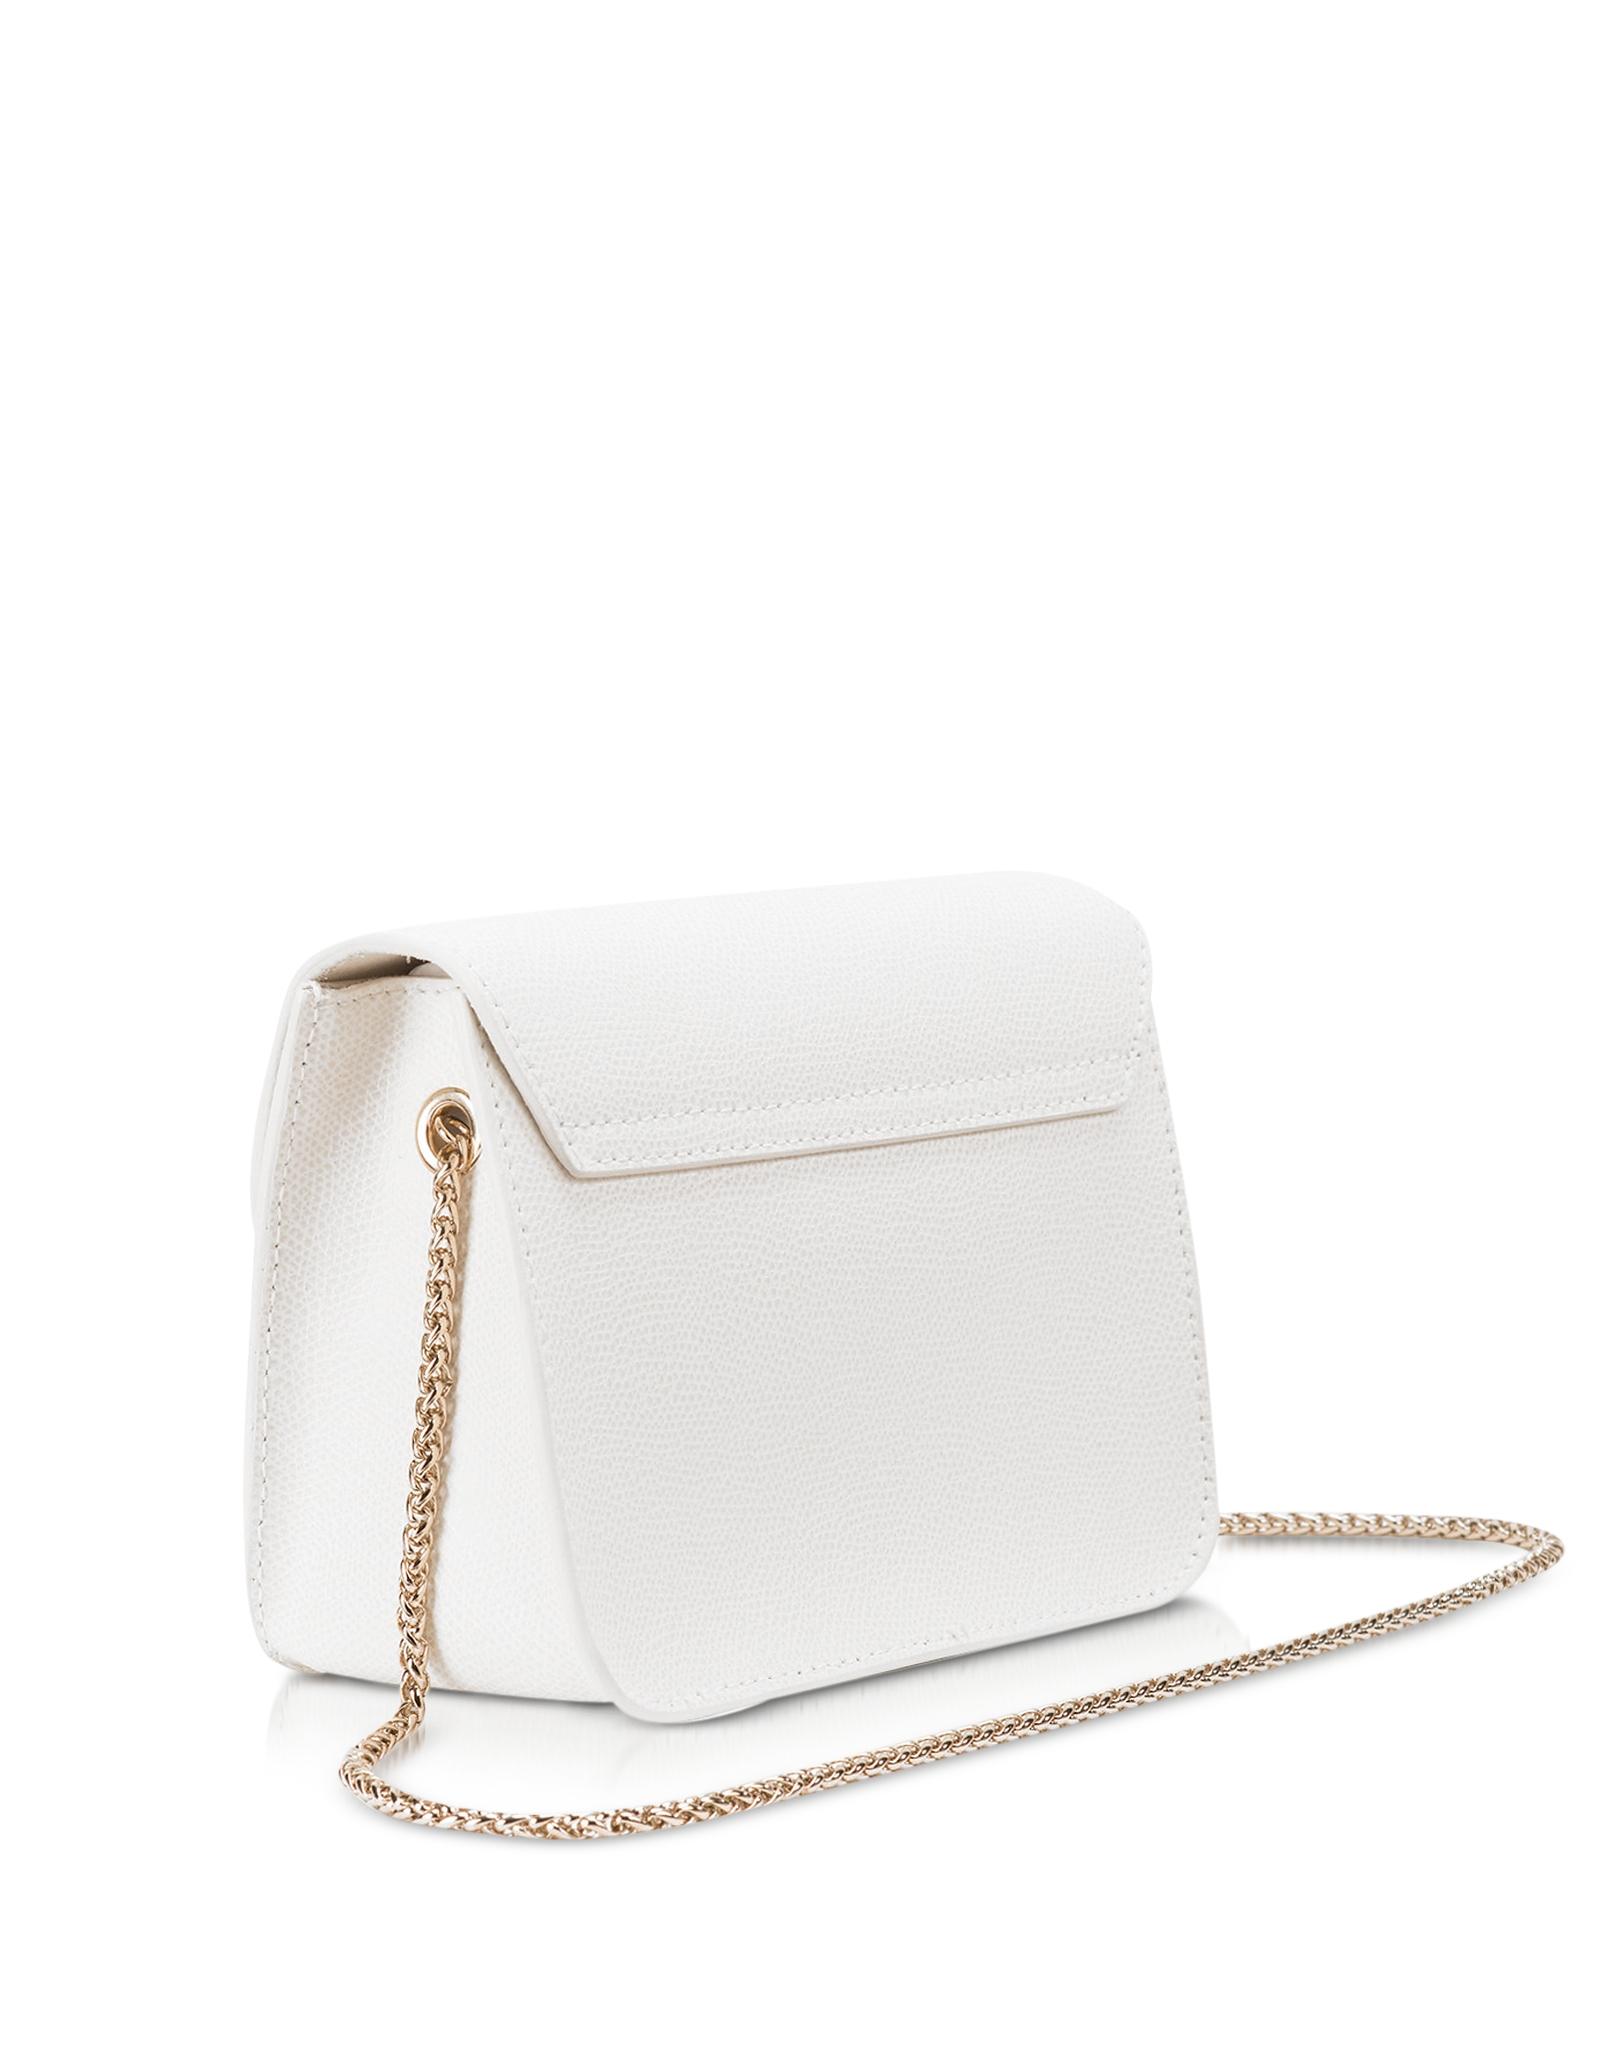 0403e80bd21 Lyst - Furla Metropolis Chalk Leather Mini Crossbody Bag in White